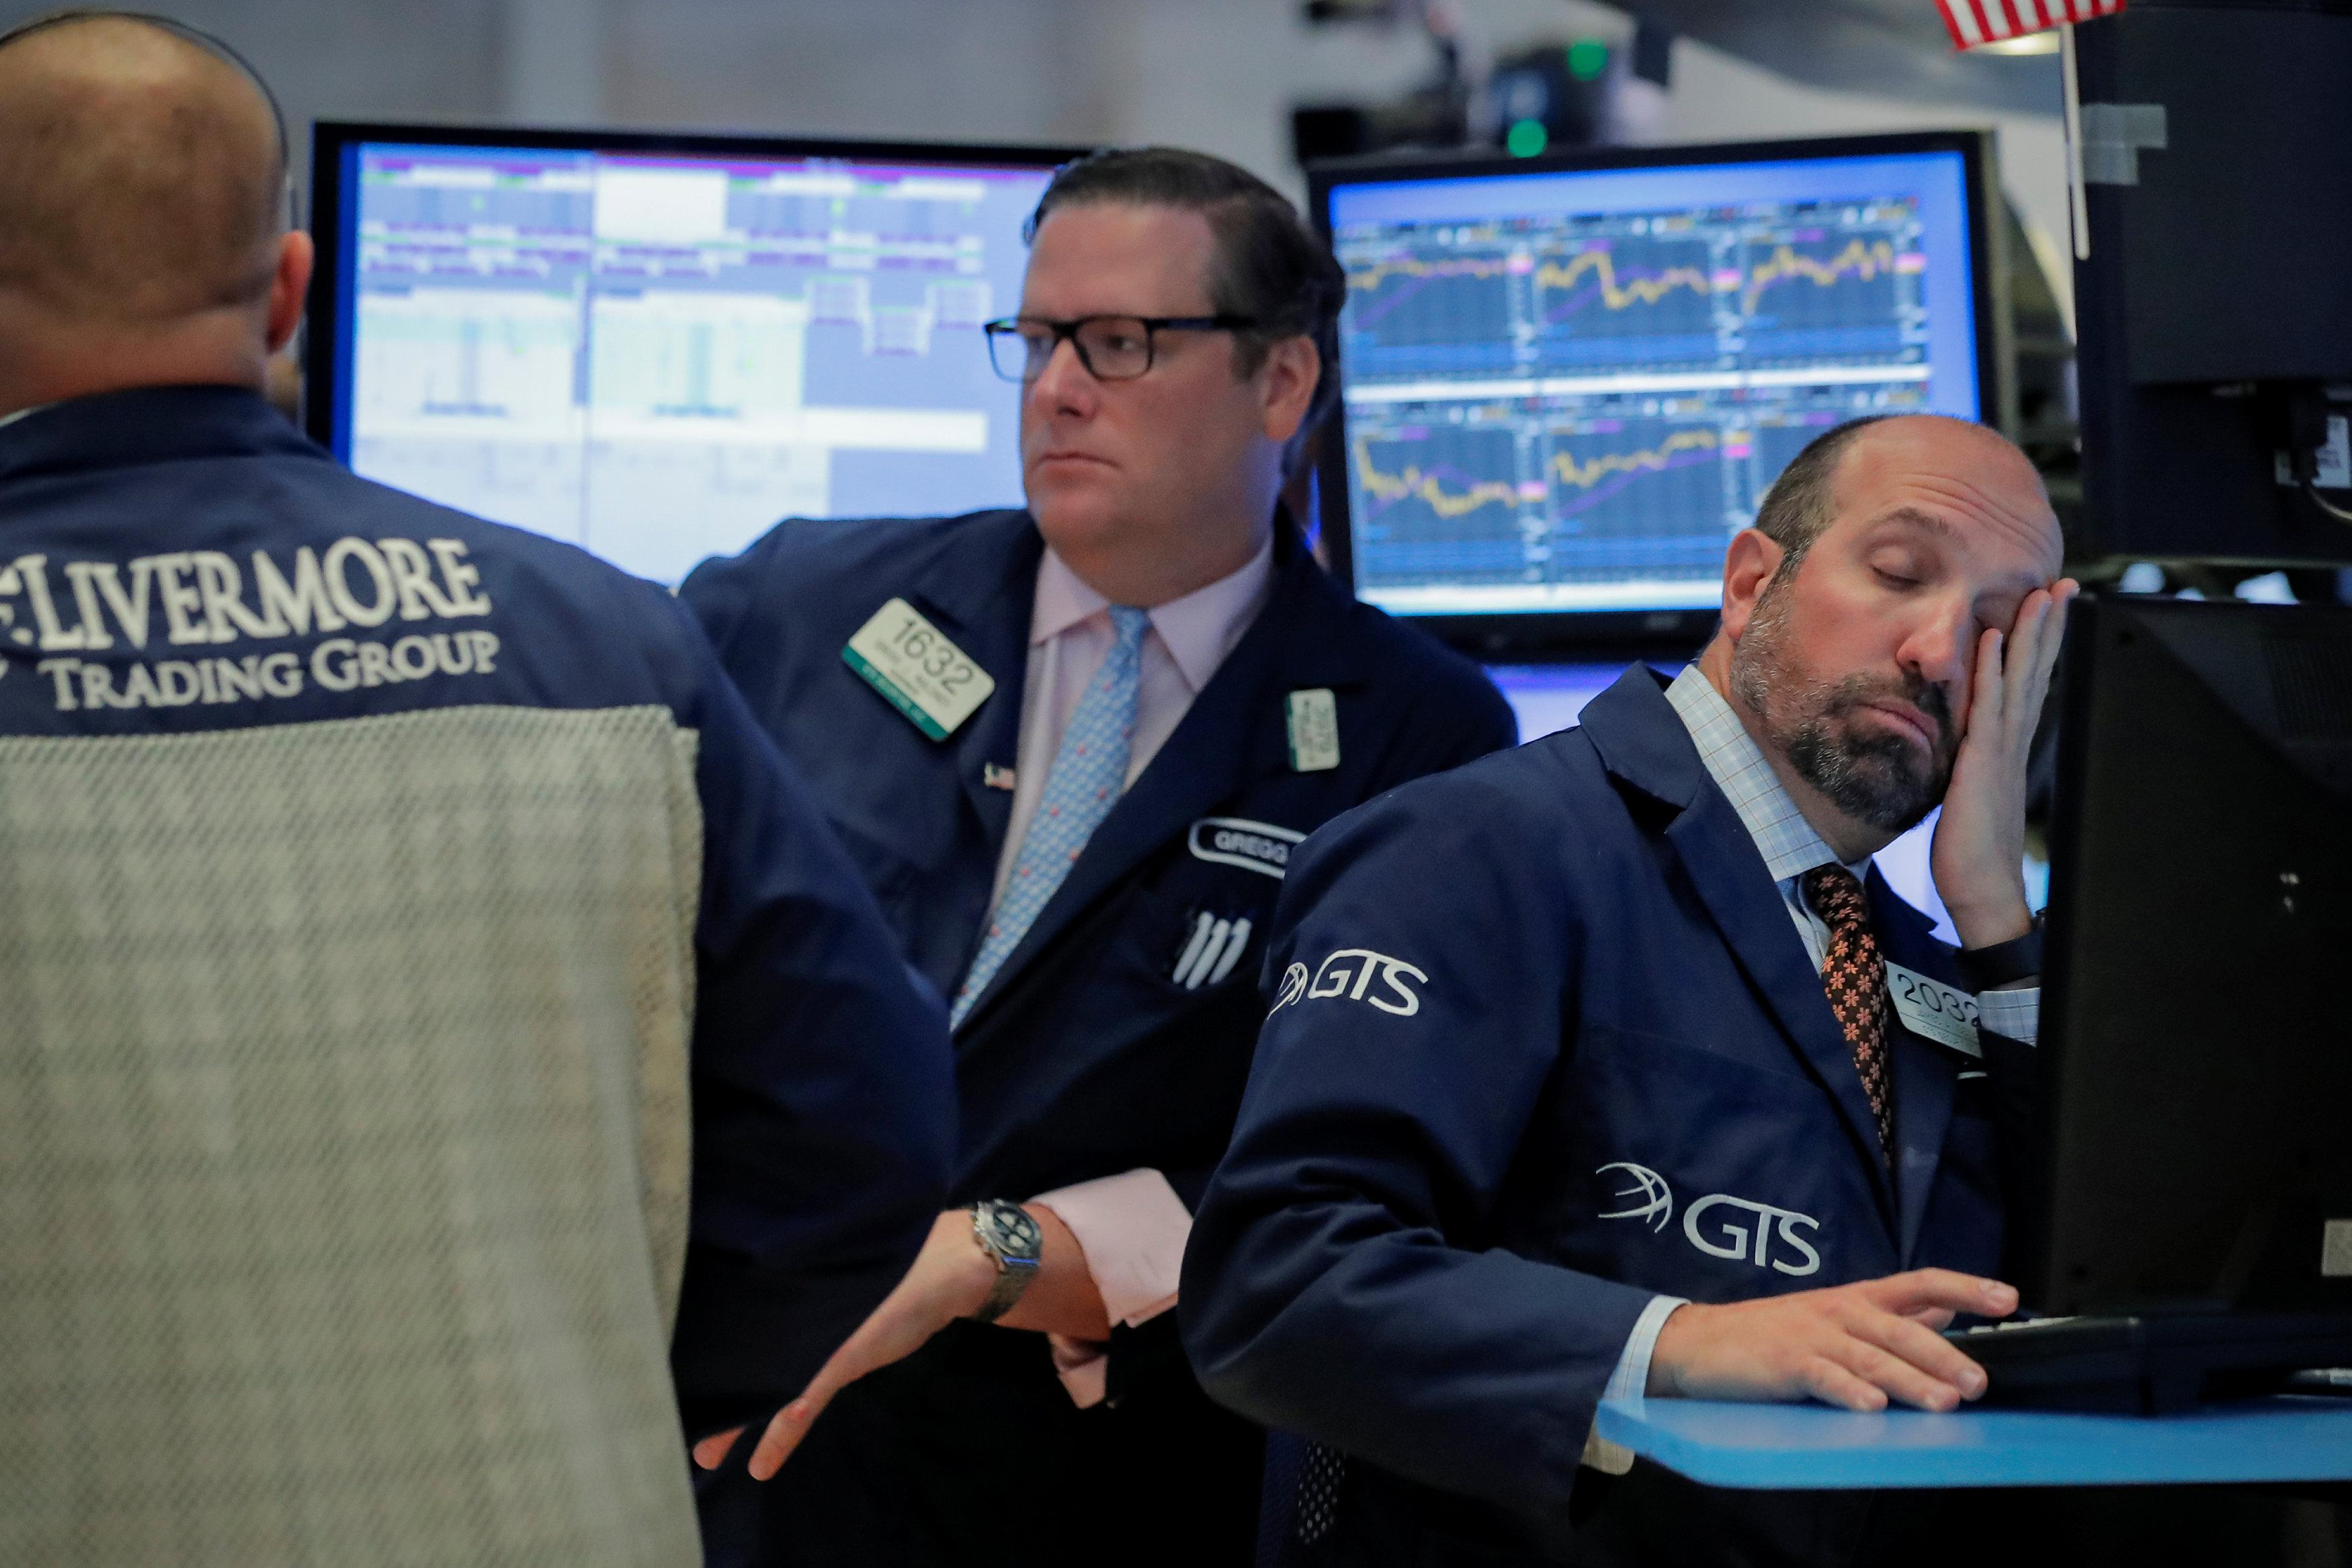 Wall Street ekes out gains as Canada takes trade spotlight